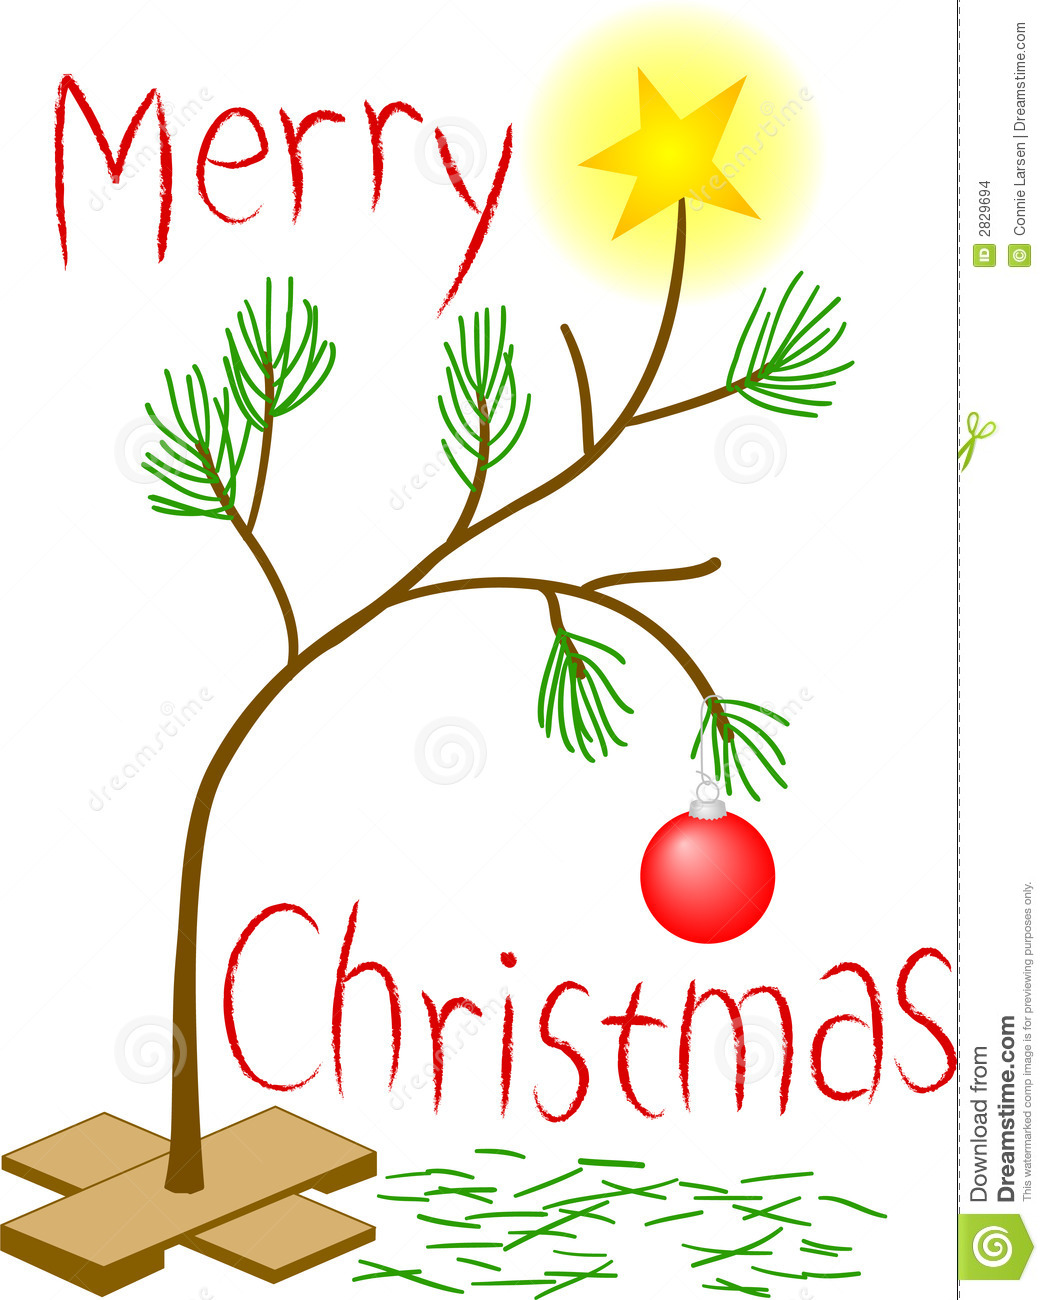 Sad Little Christmas Tree stock illustration. Illustration of.